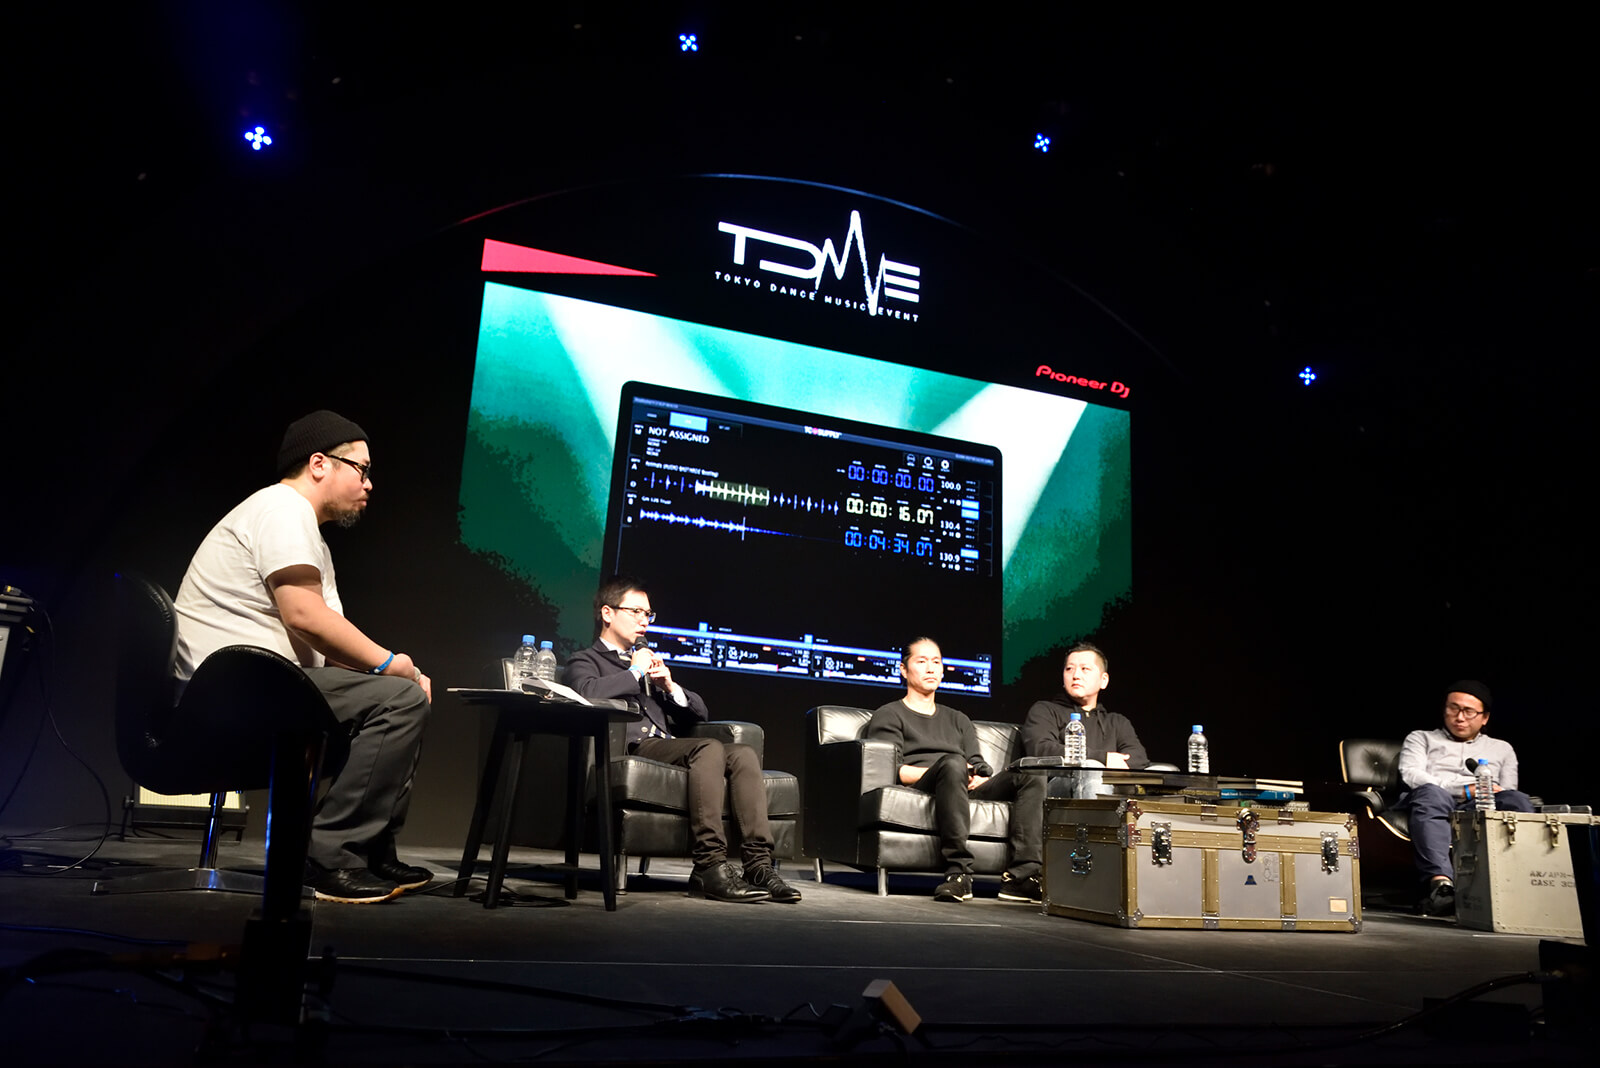 TDME 2017